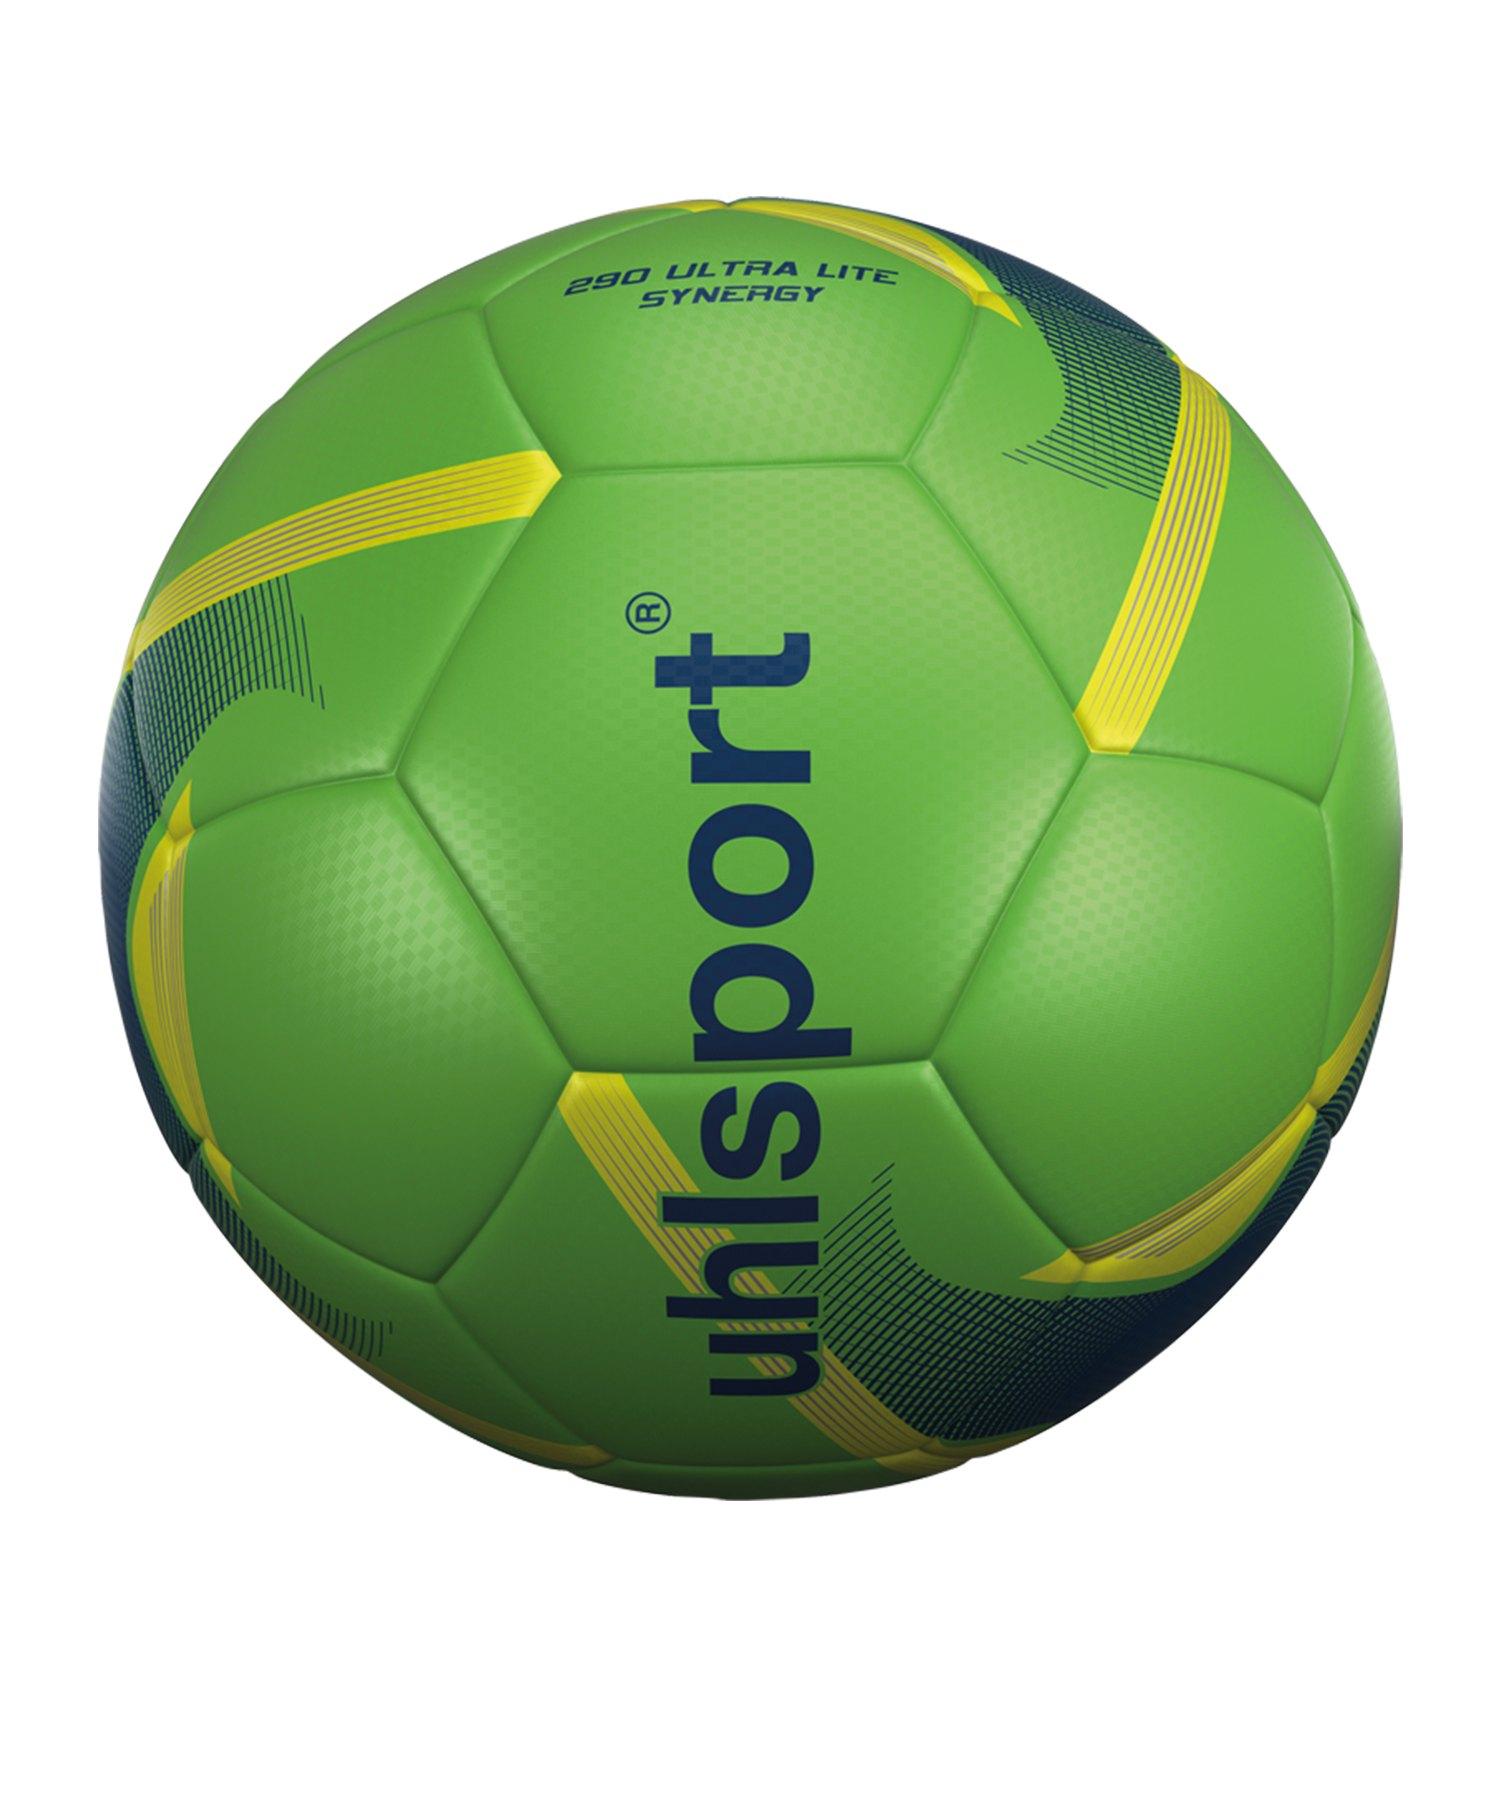 Uhlsport Infinity 290 Ultra Lite 2.0 Fussball BlauF01 - gruen